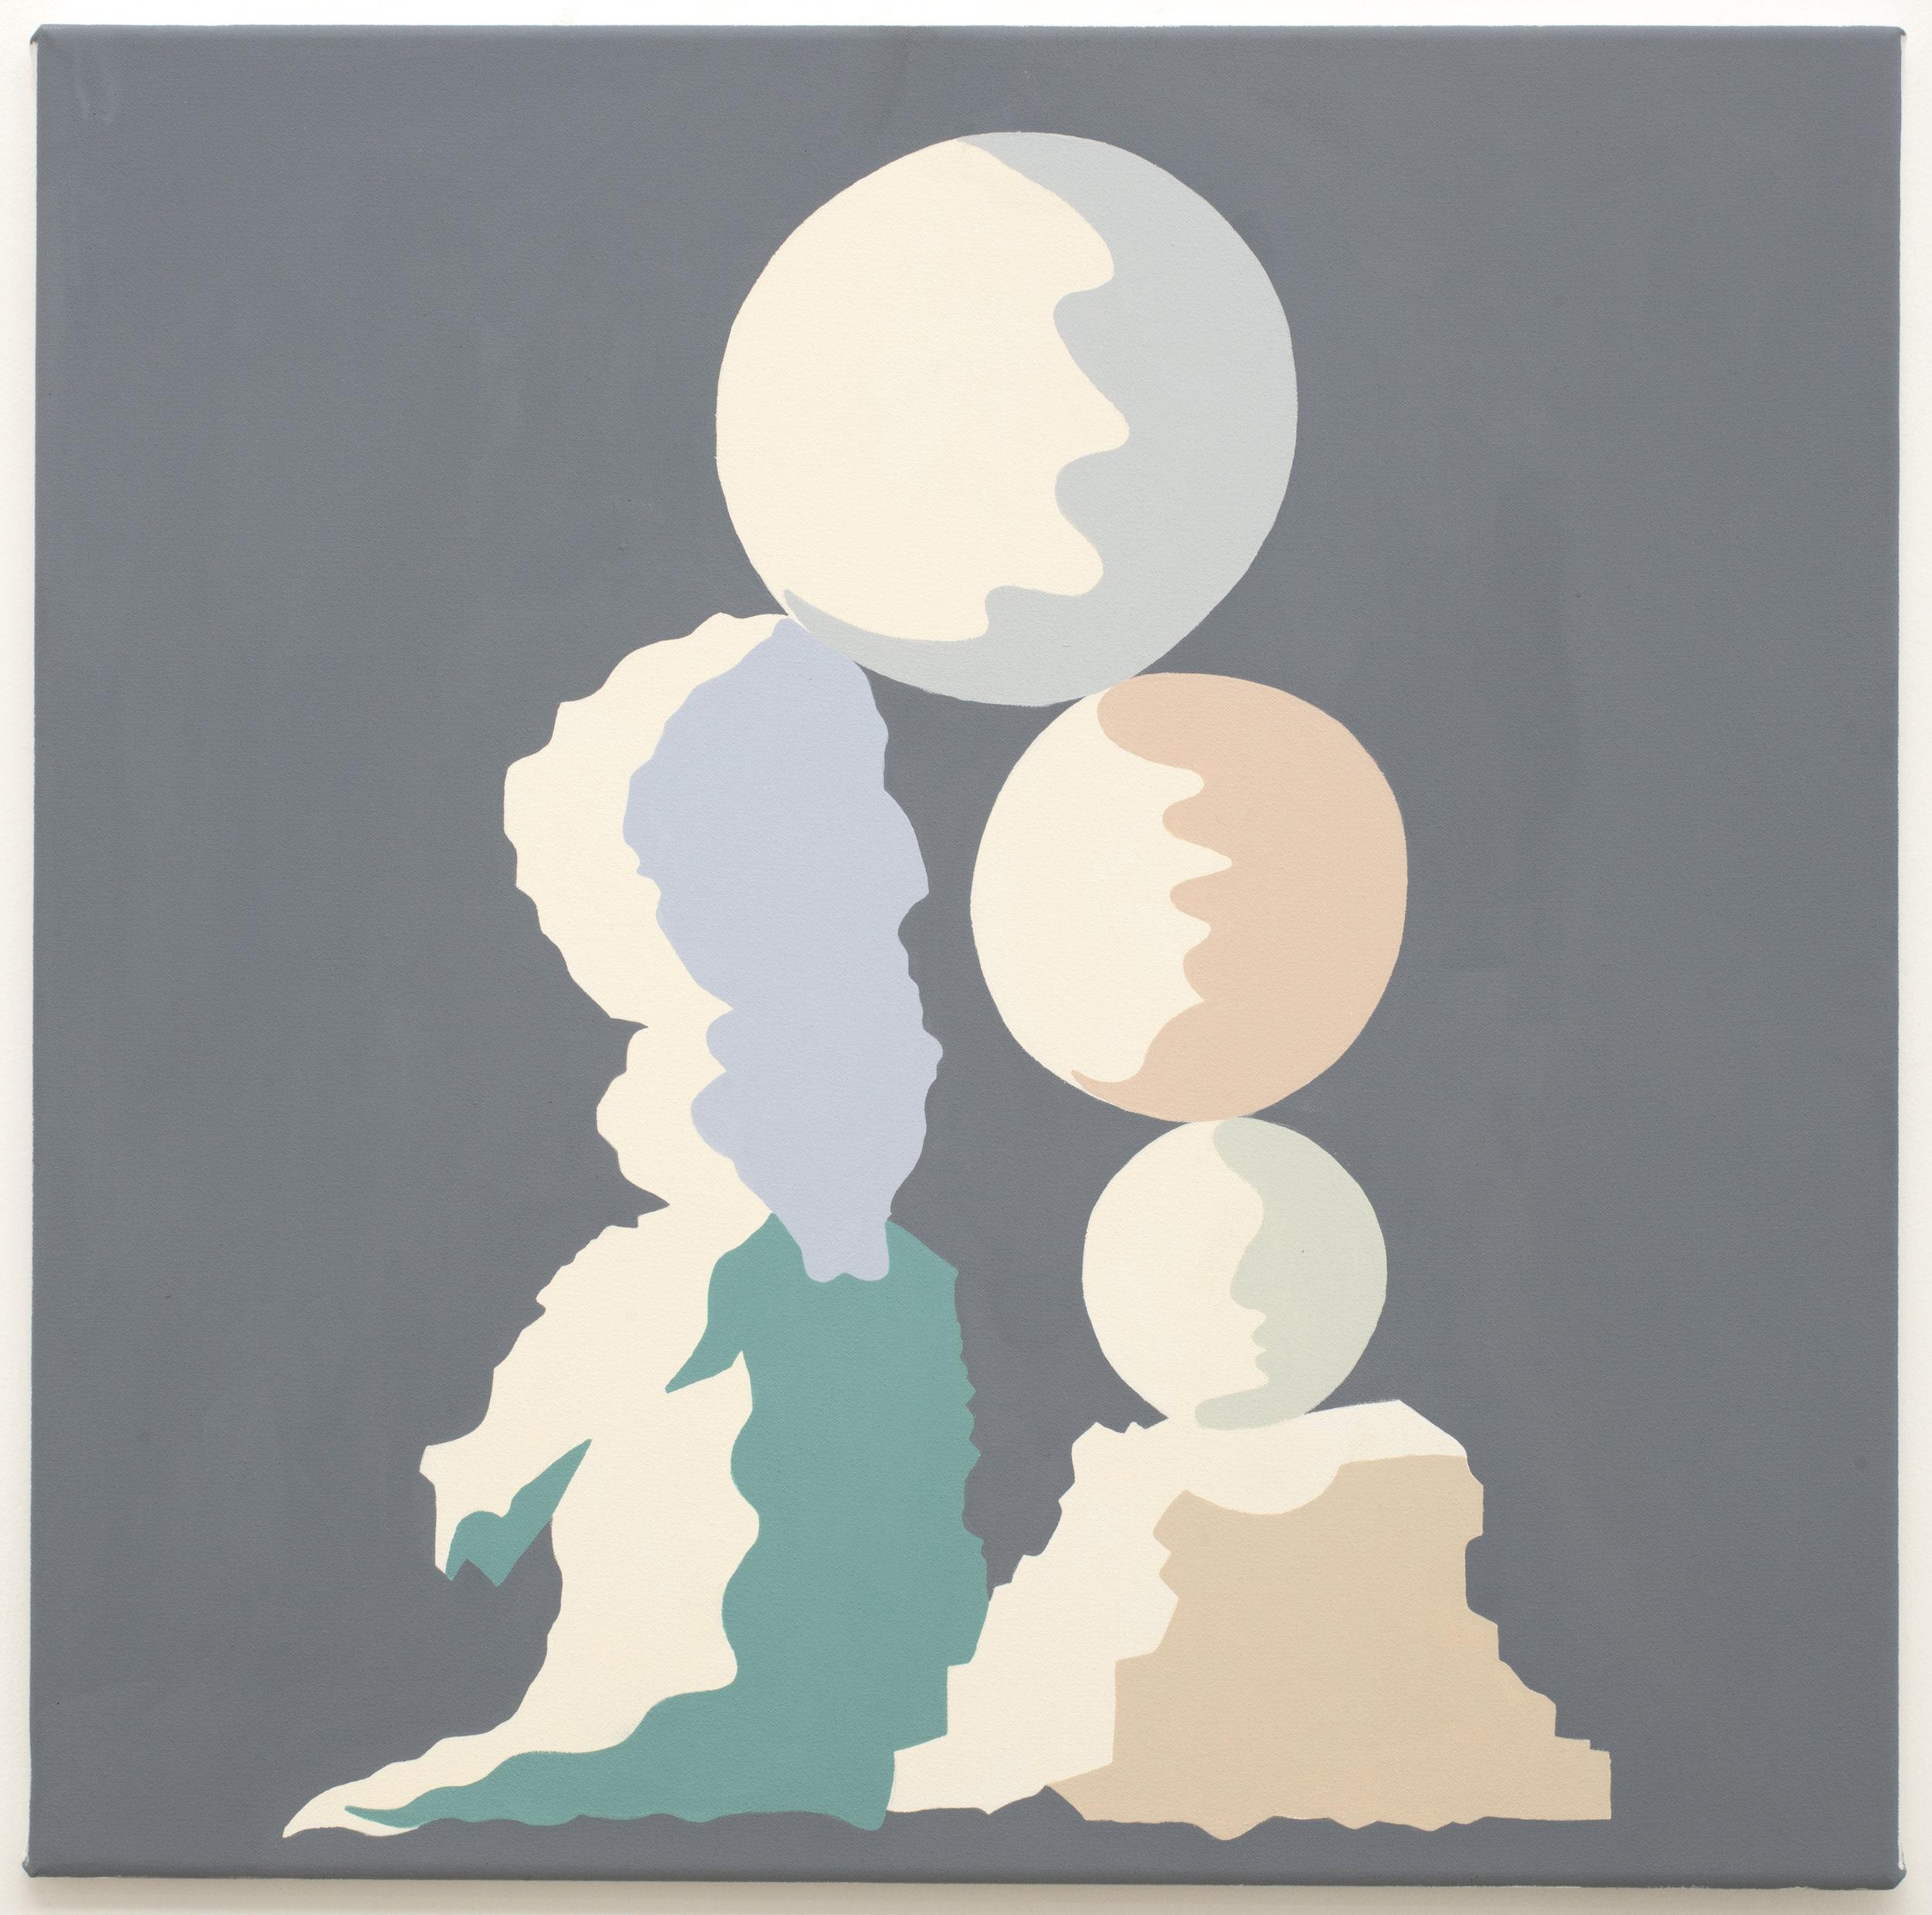 MICHELLE HANLIN  Act  2018 vinyl paint on canvas 61 x 61 cm